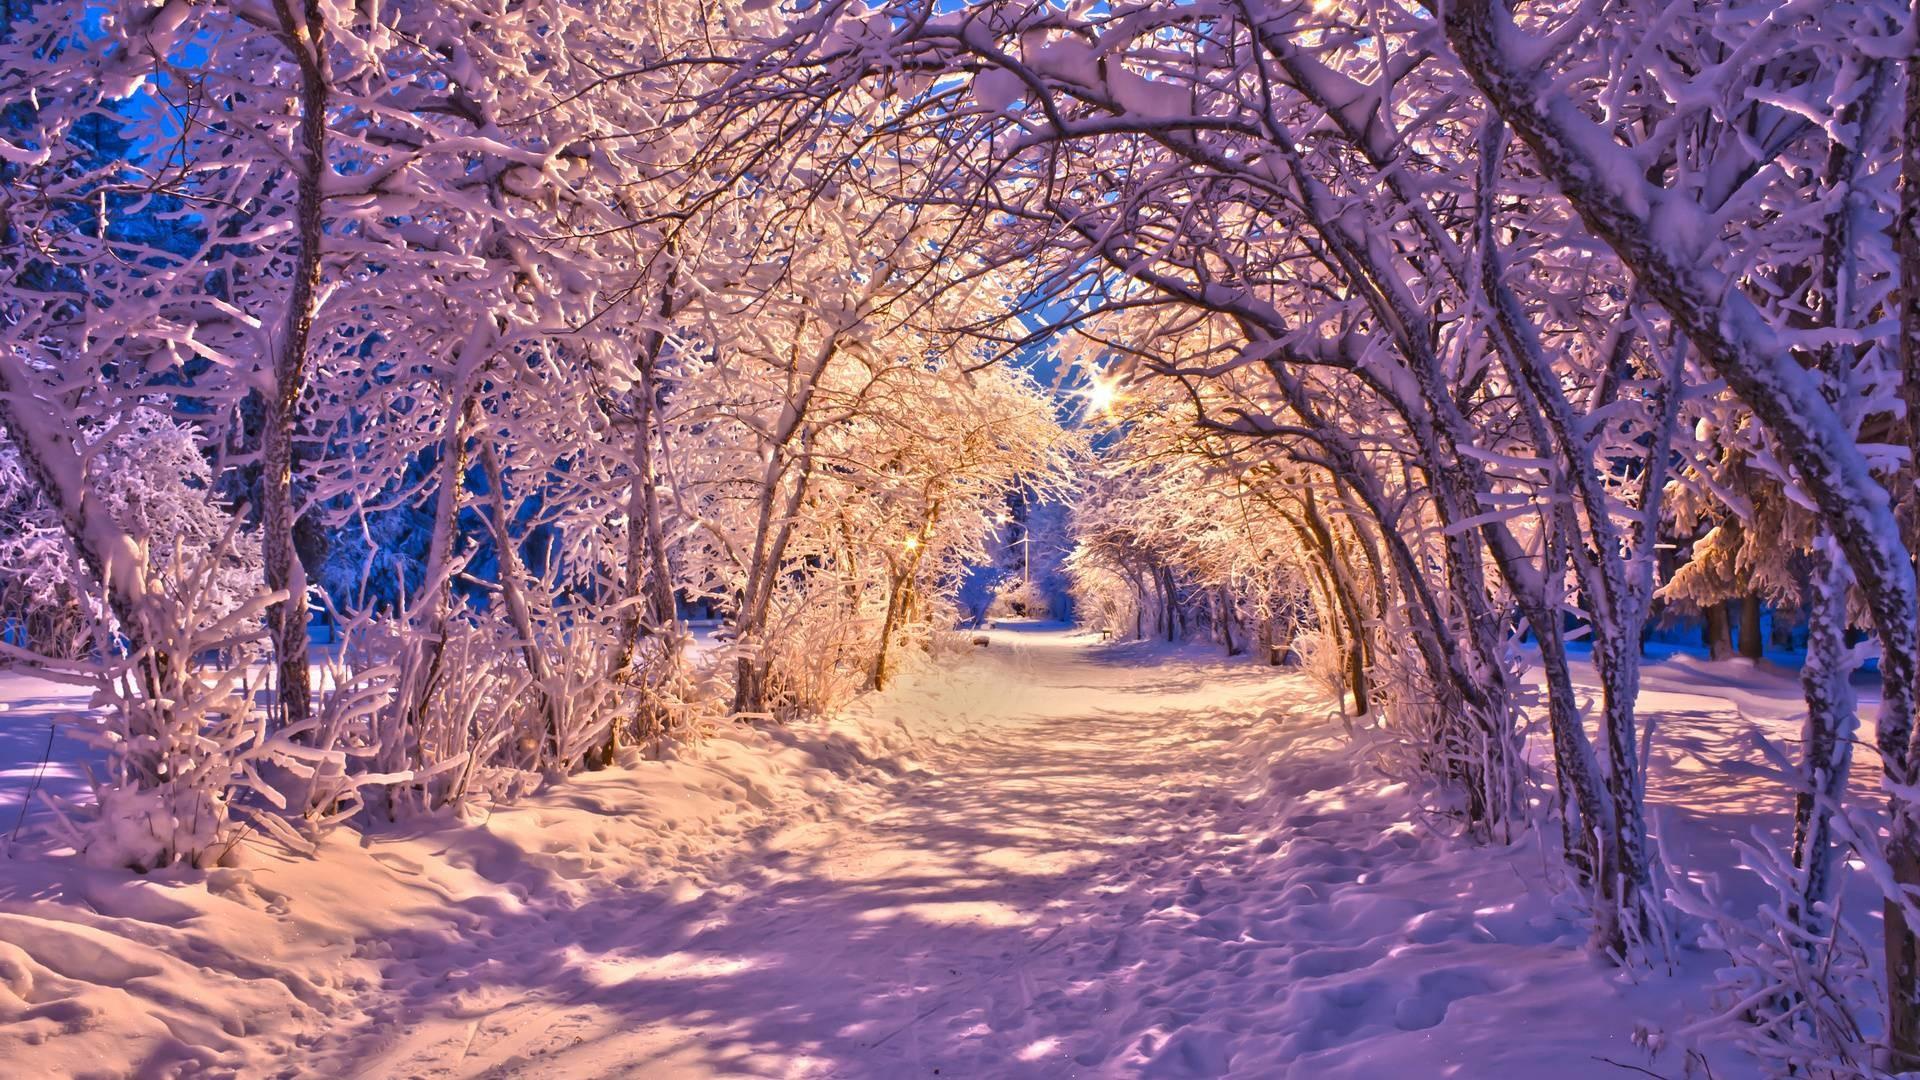 Amazing Snowed Forest Winter Wallpaper, iPhone Wallpaper, Facebook .